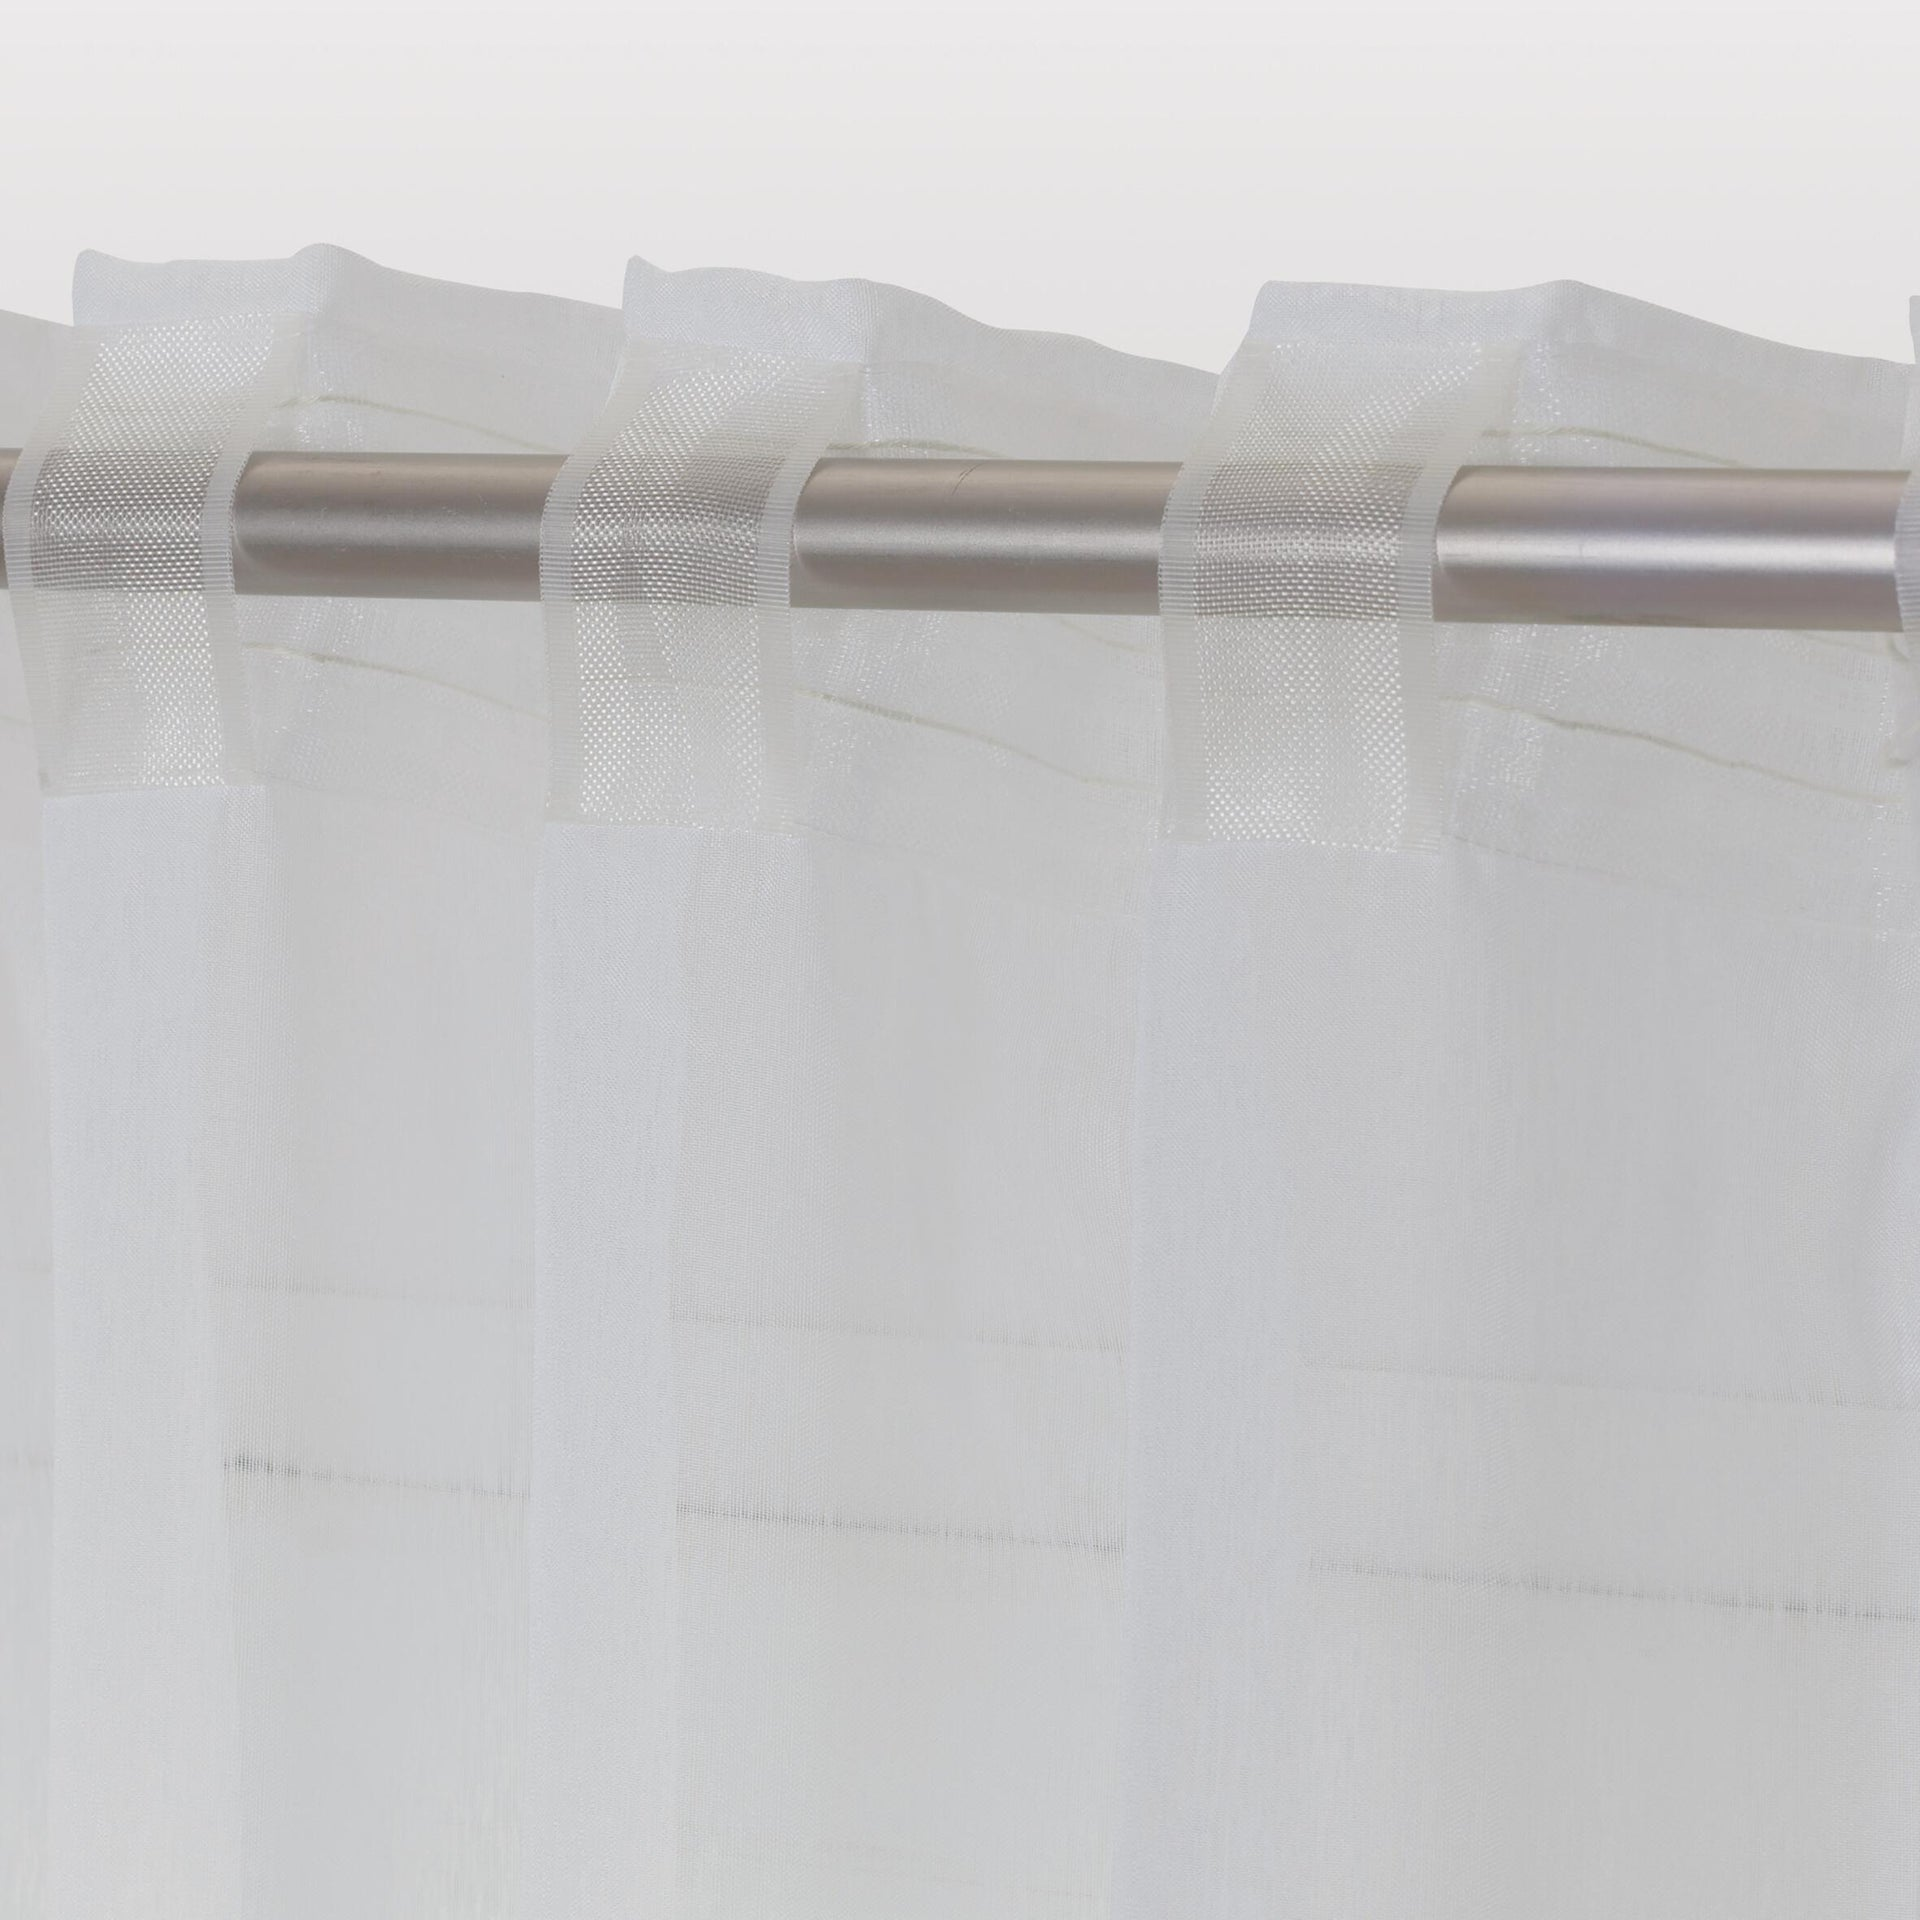 Tenda INSPIRE Softy bianco fettuccia e passanti 200 x 280 cm - 6